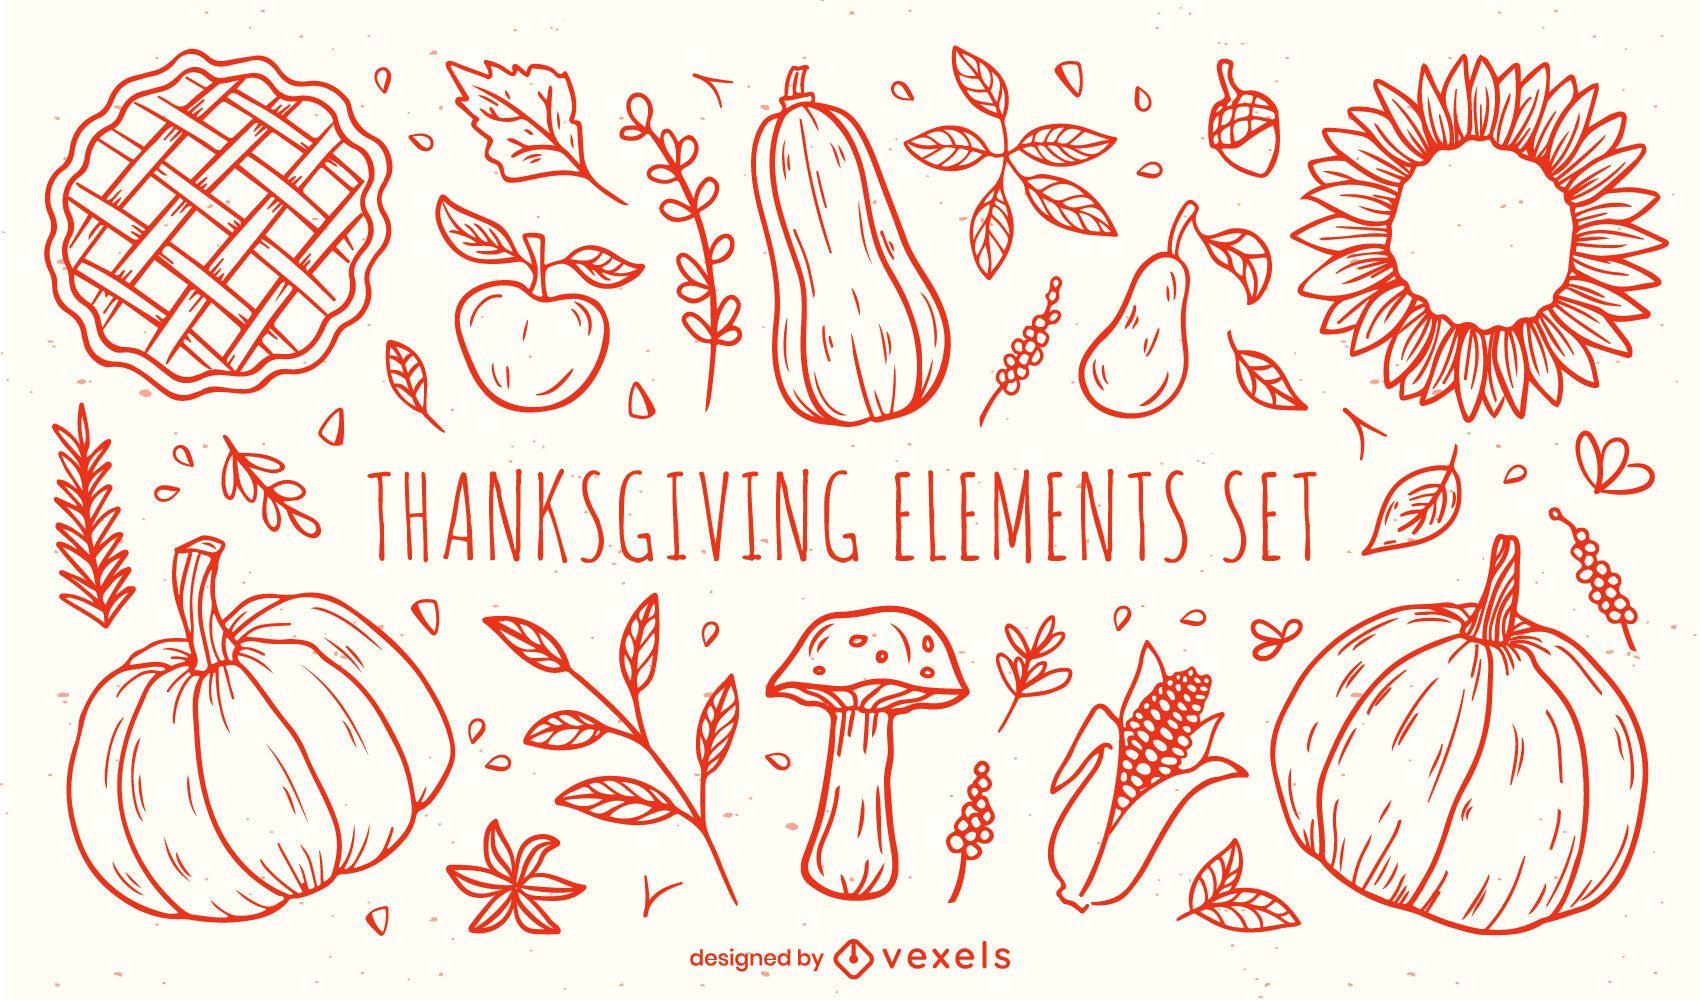 Thanksgiving elements hand drawn set